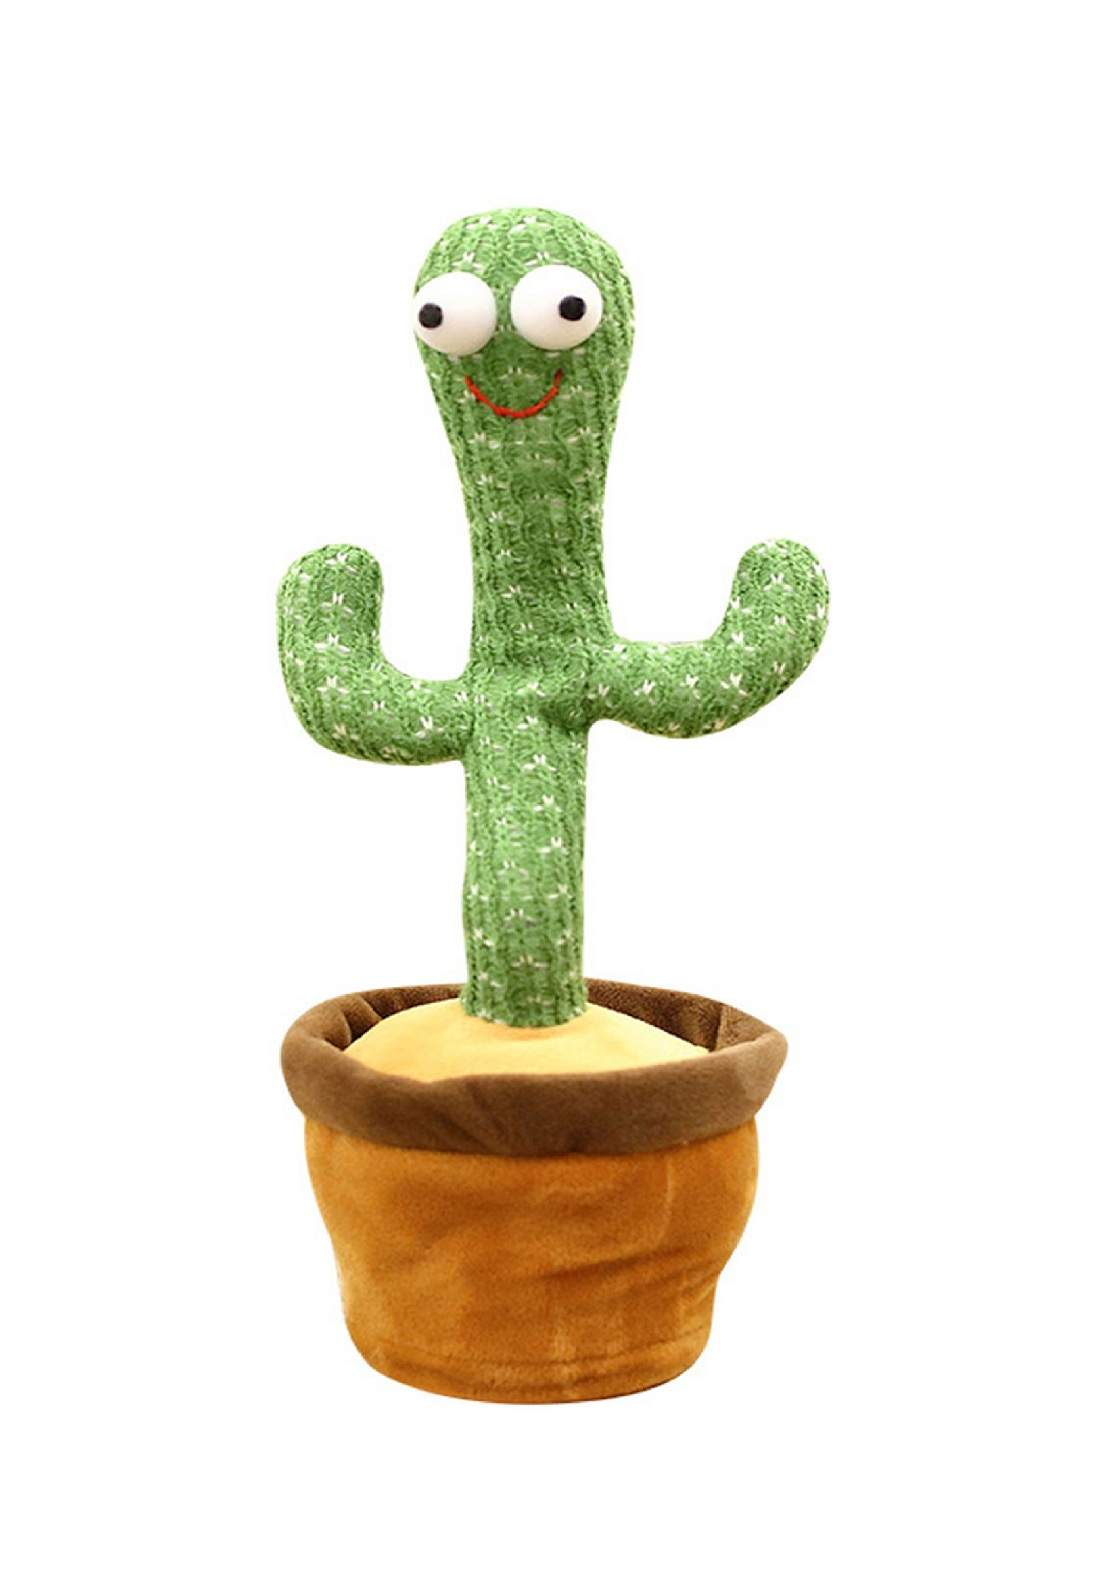 Talking Cactus Game For Kids  الصبارة الناطقة للاطفال